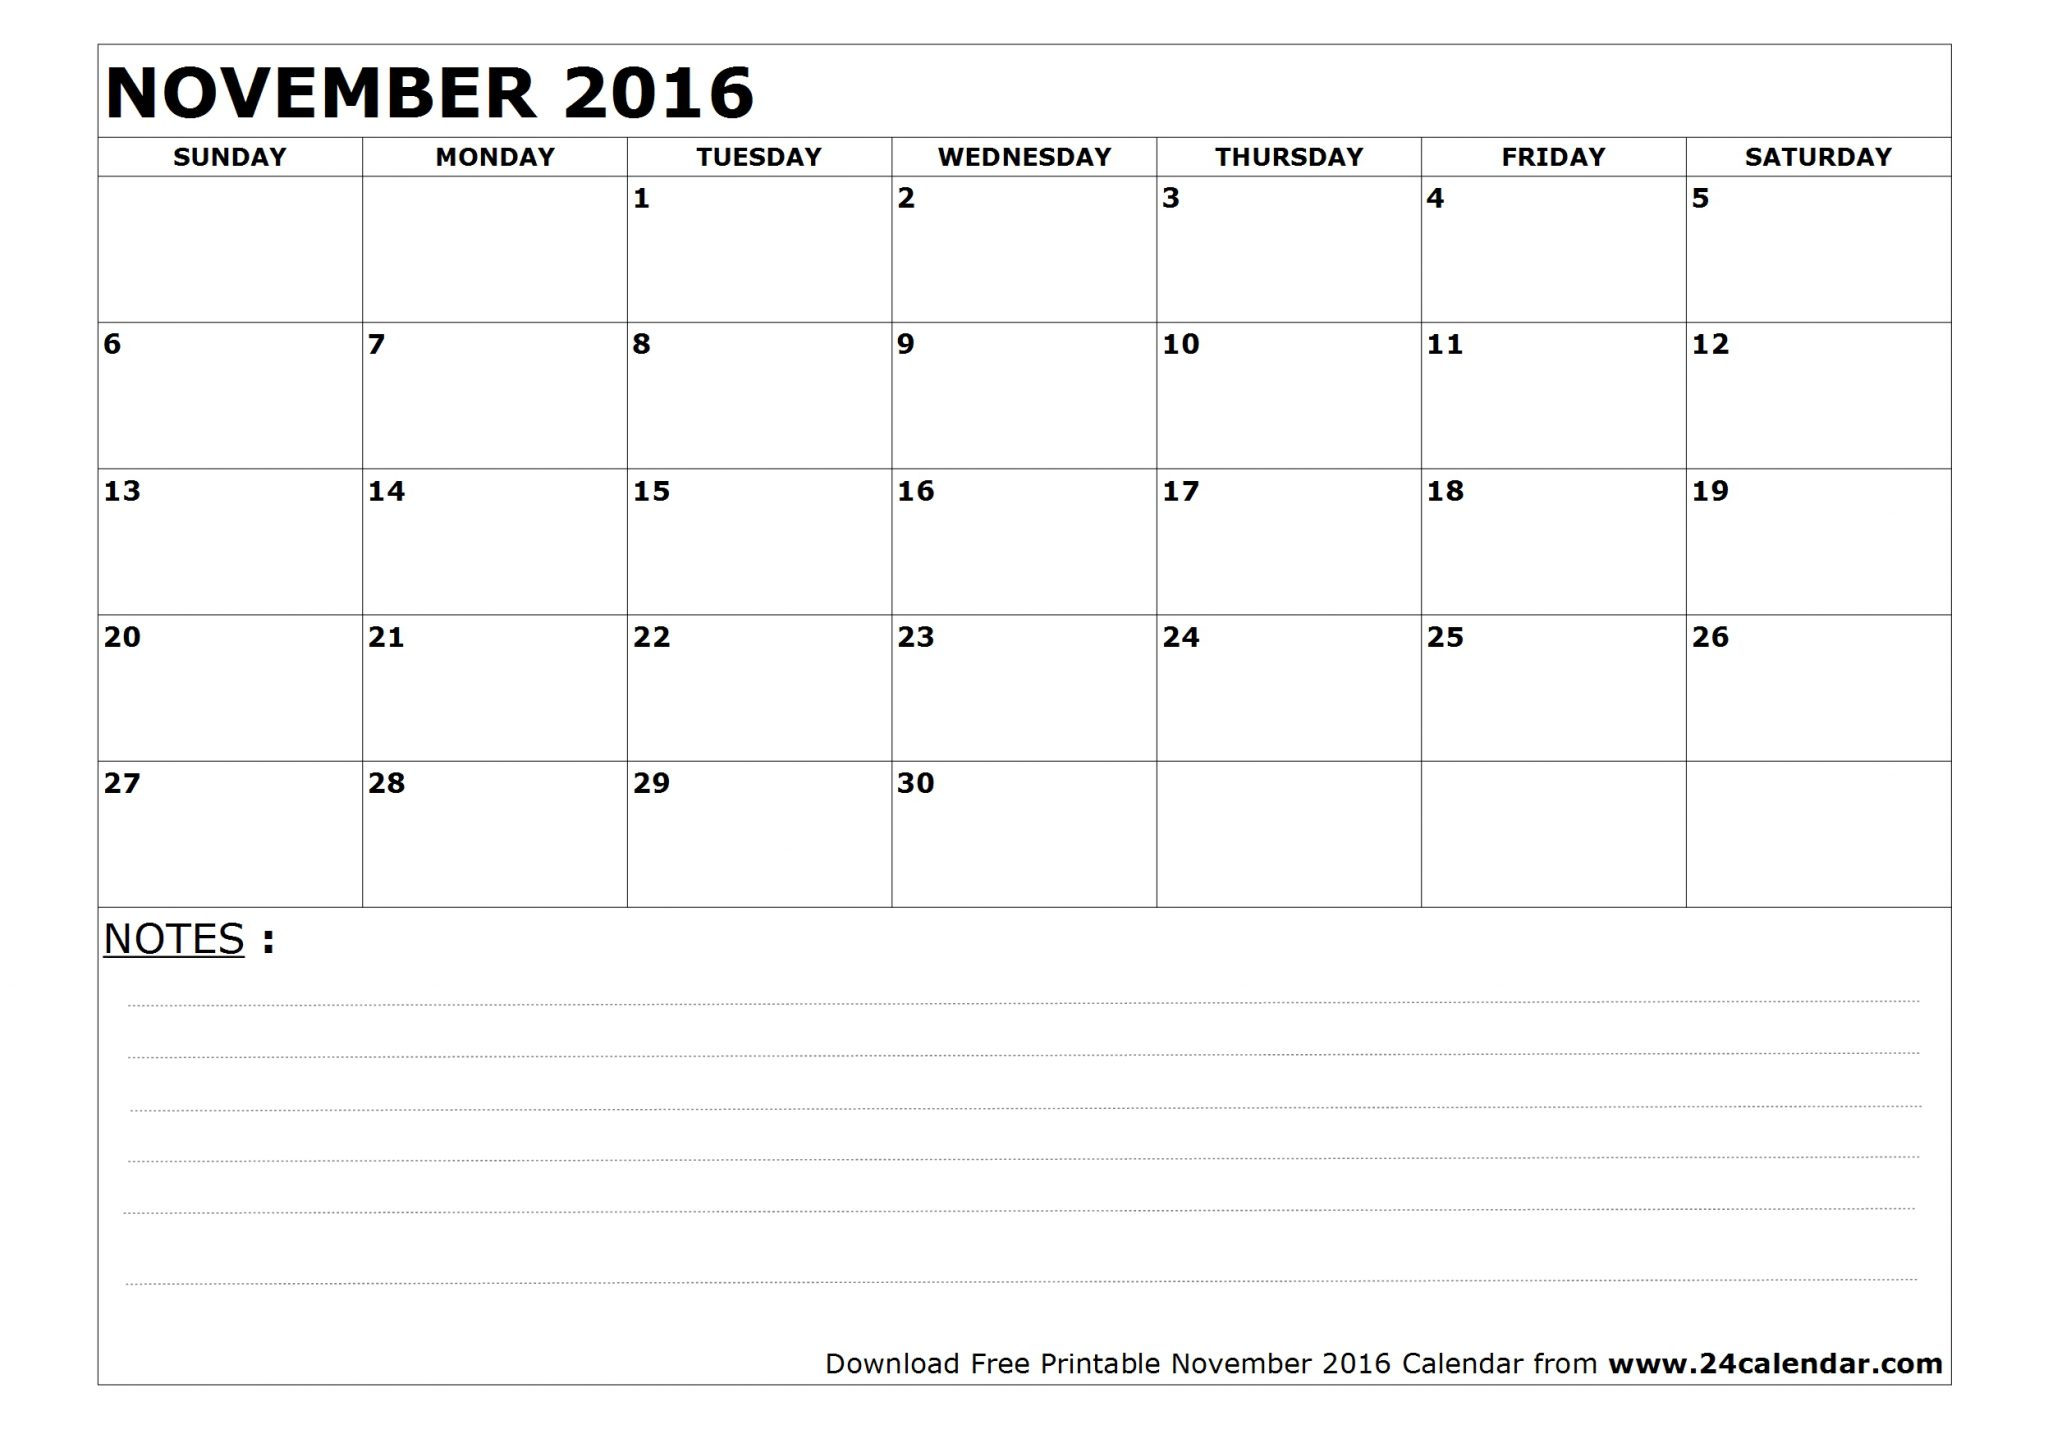 december 2015 calendar word document